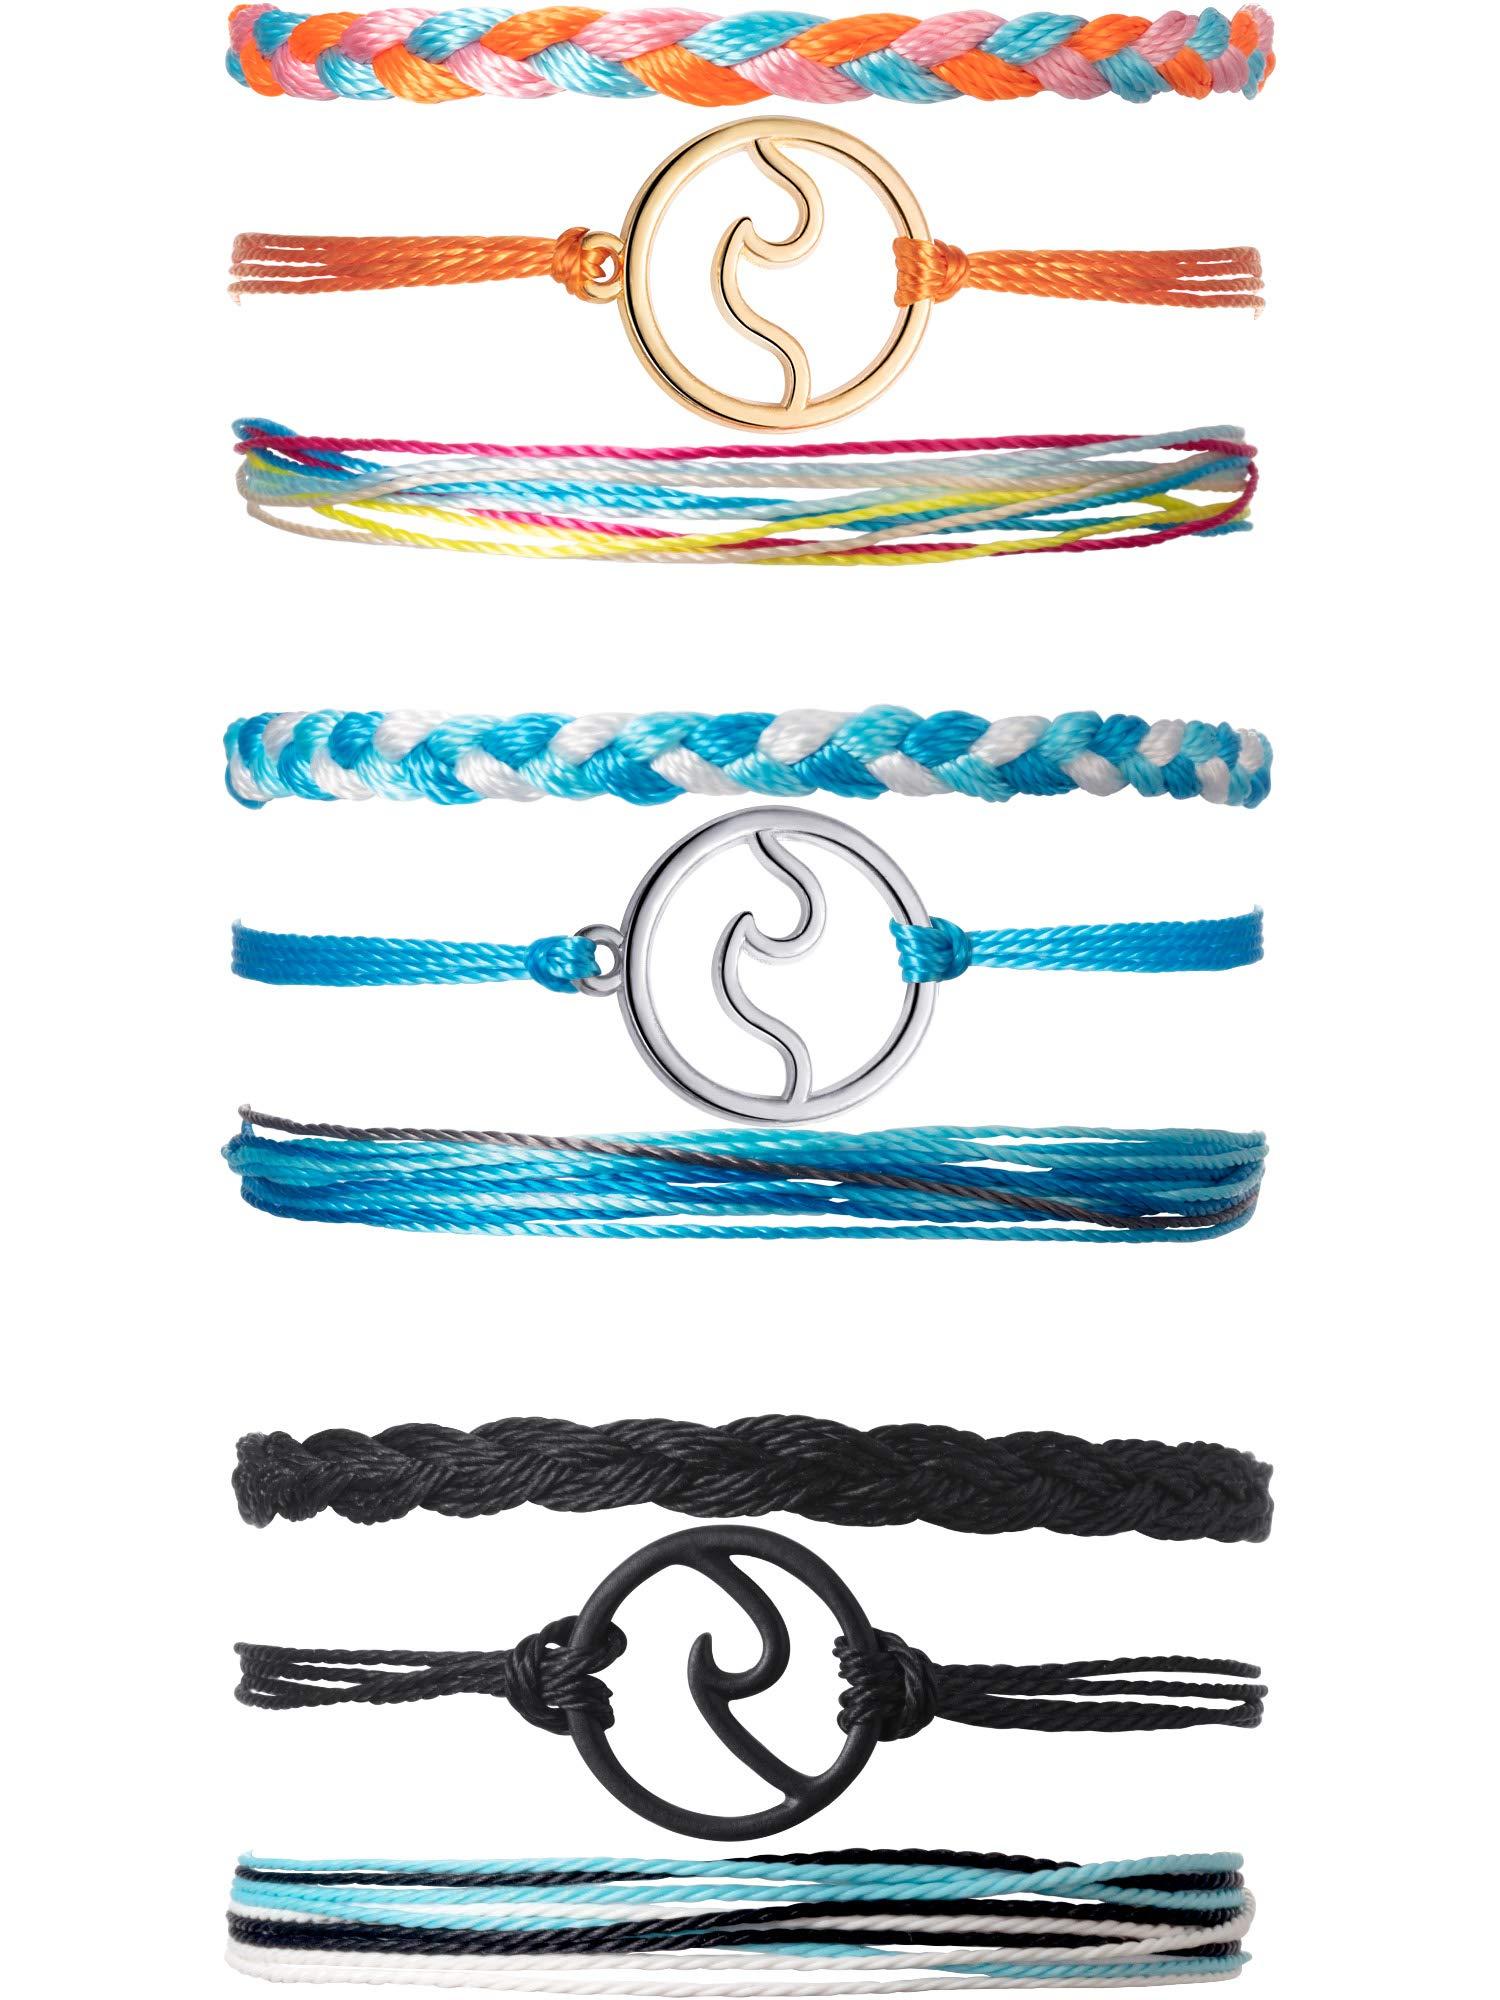 Chuangdi 3 Sets Wave Bracelet Braided Rope Bracelet Set Adjustable Friendship Bohemian Handmade Bracelet Waterproof for Women Men (Color 3) by Chuangdi